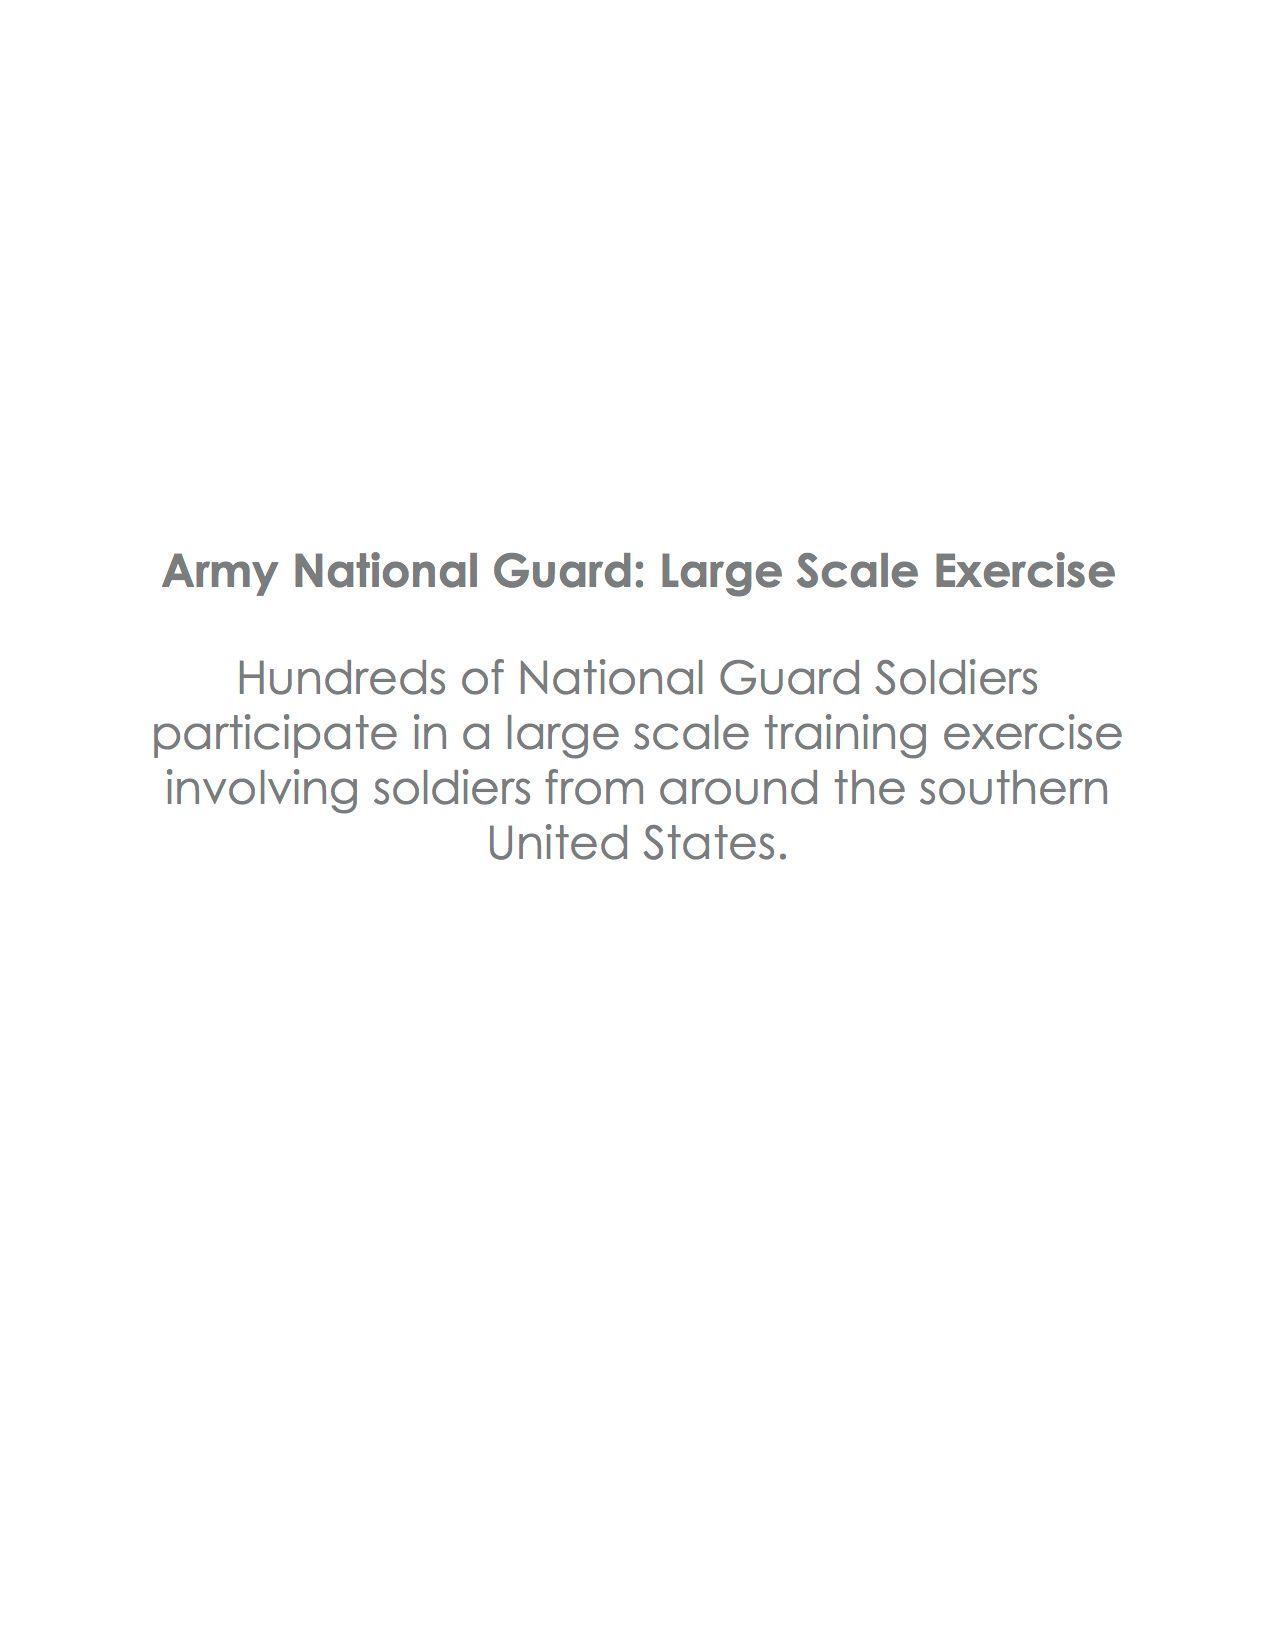 6_army_national_guard.jpg